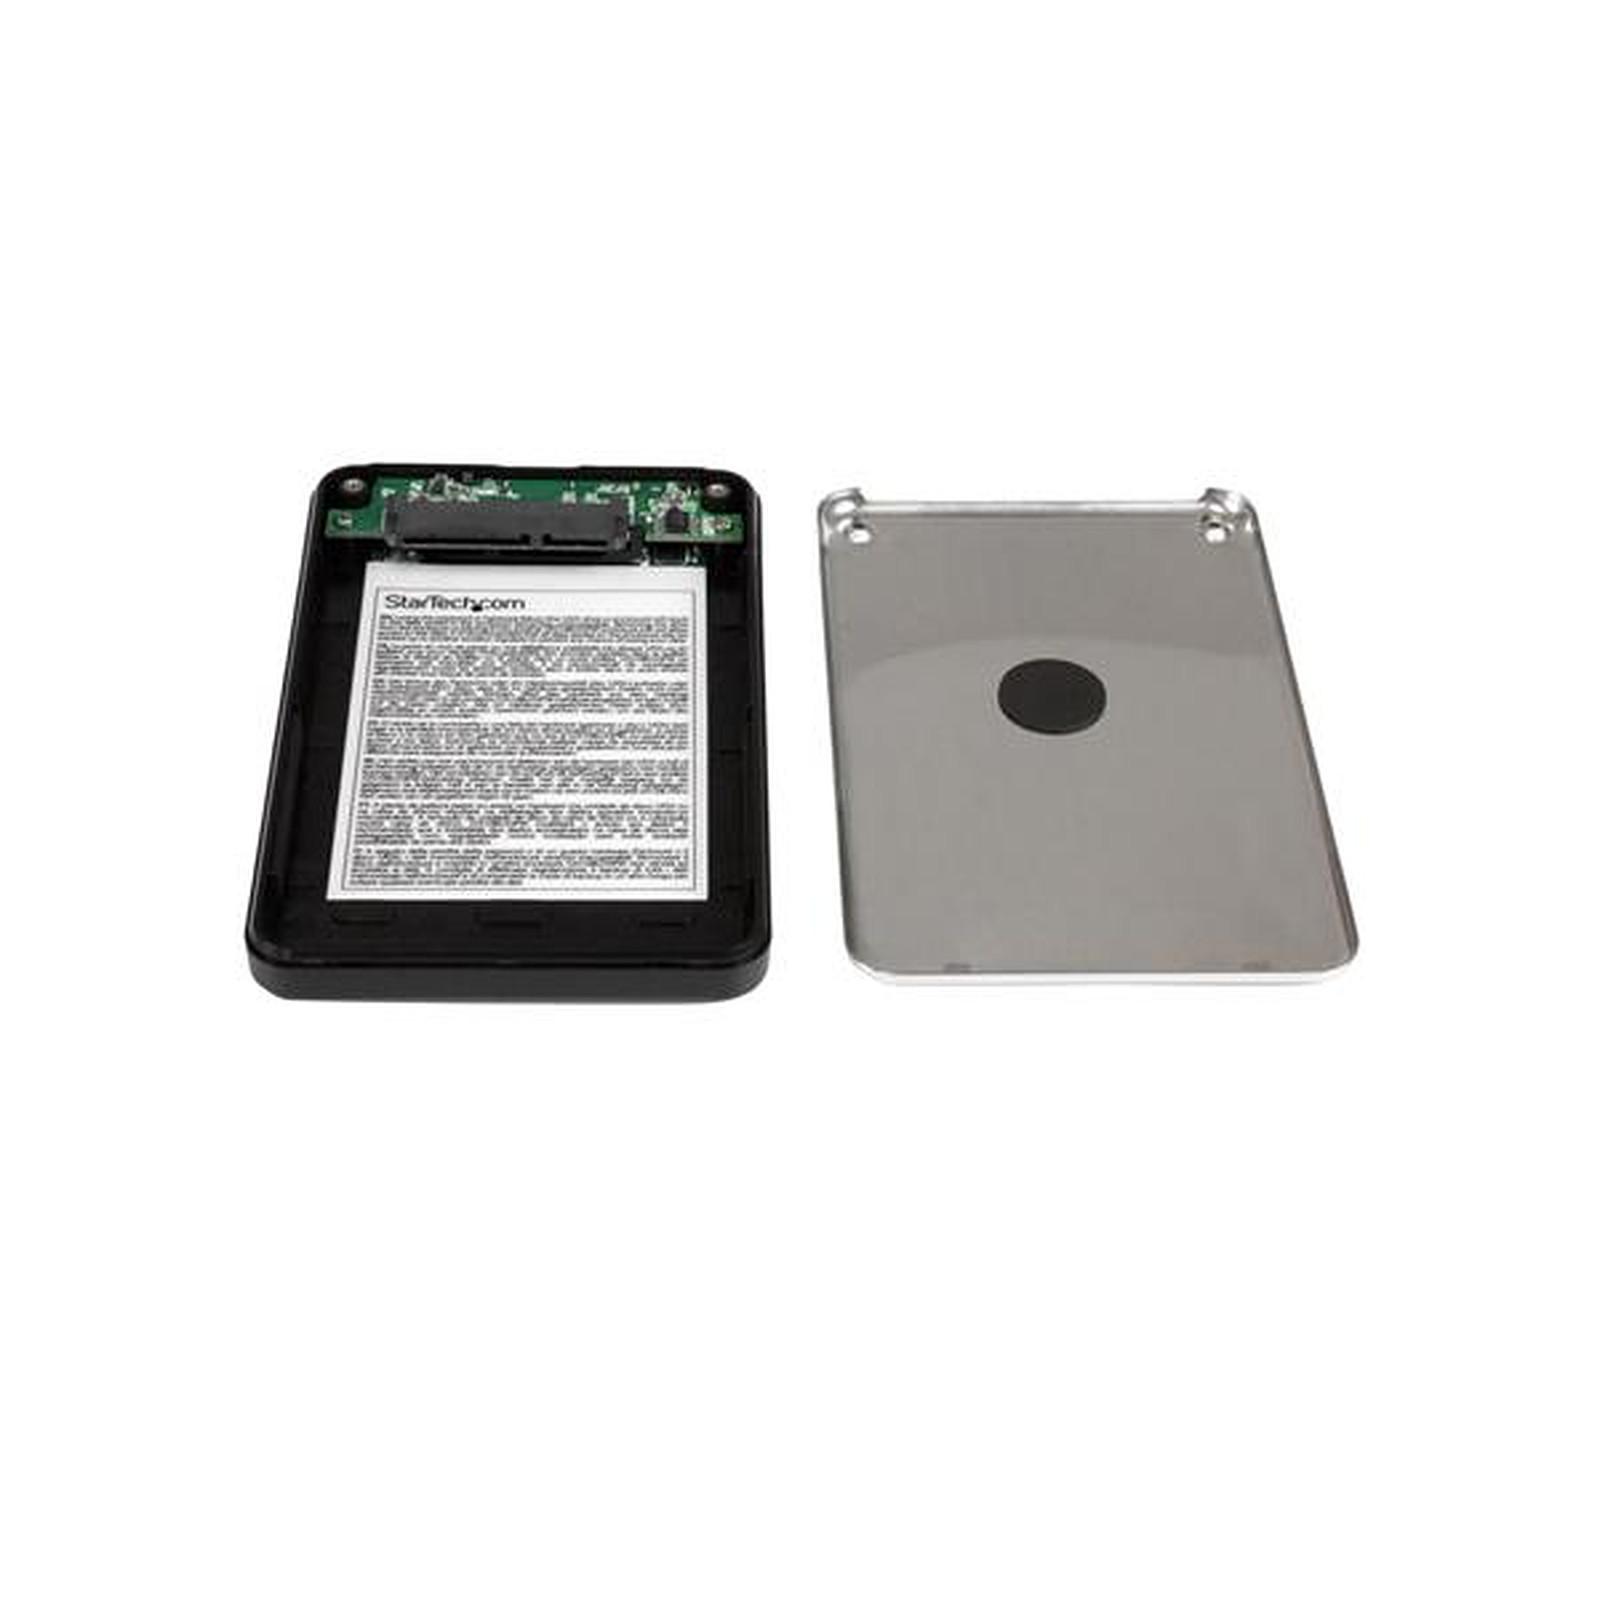 SSD SATA USB 3.0 C/âble SATA USB Disque Dur 2.5 SSD HDD Adaptateur SATA III USB 3.0 Cable Adapter UASP pour Desktops Laptops Compatible Windows//Mac OS GeekerChip USB 3.0 vers SATA III